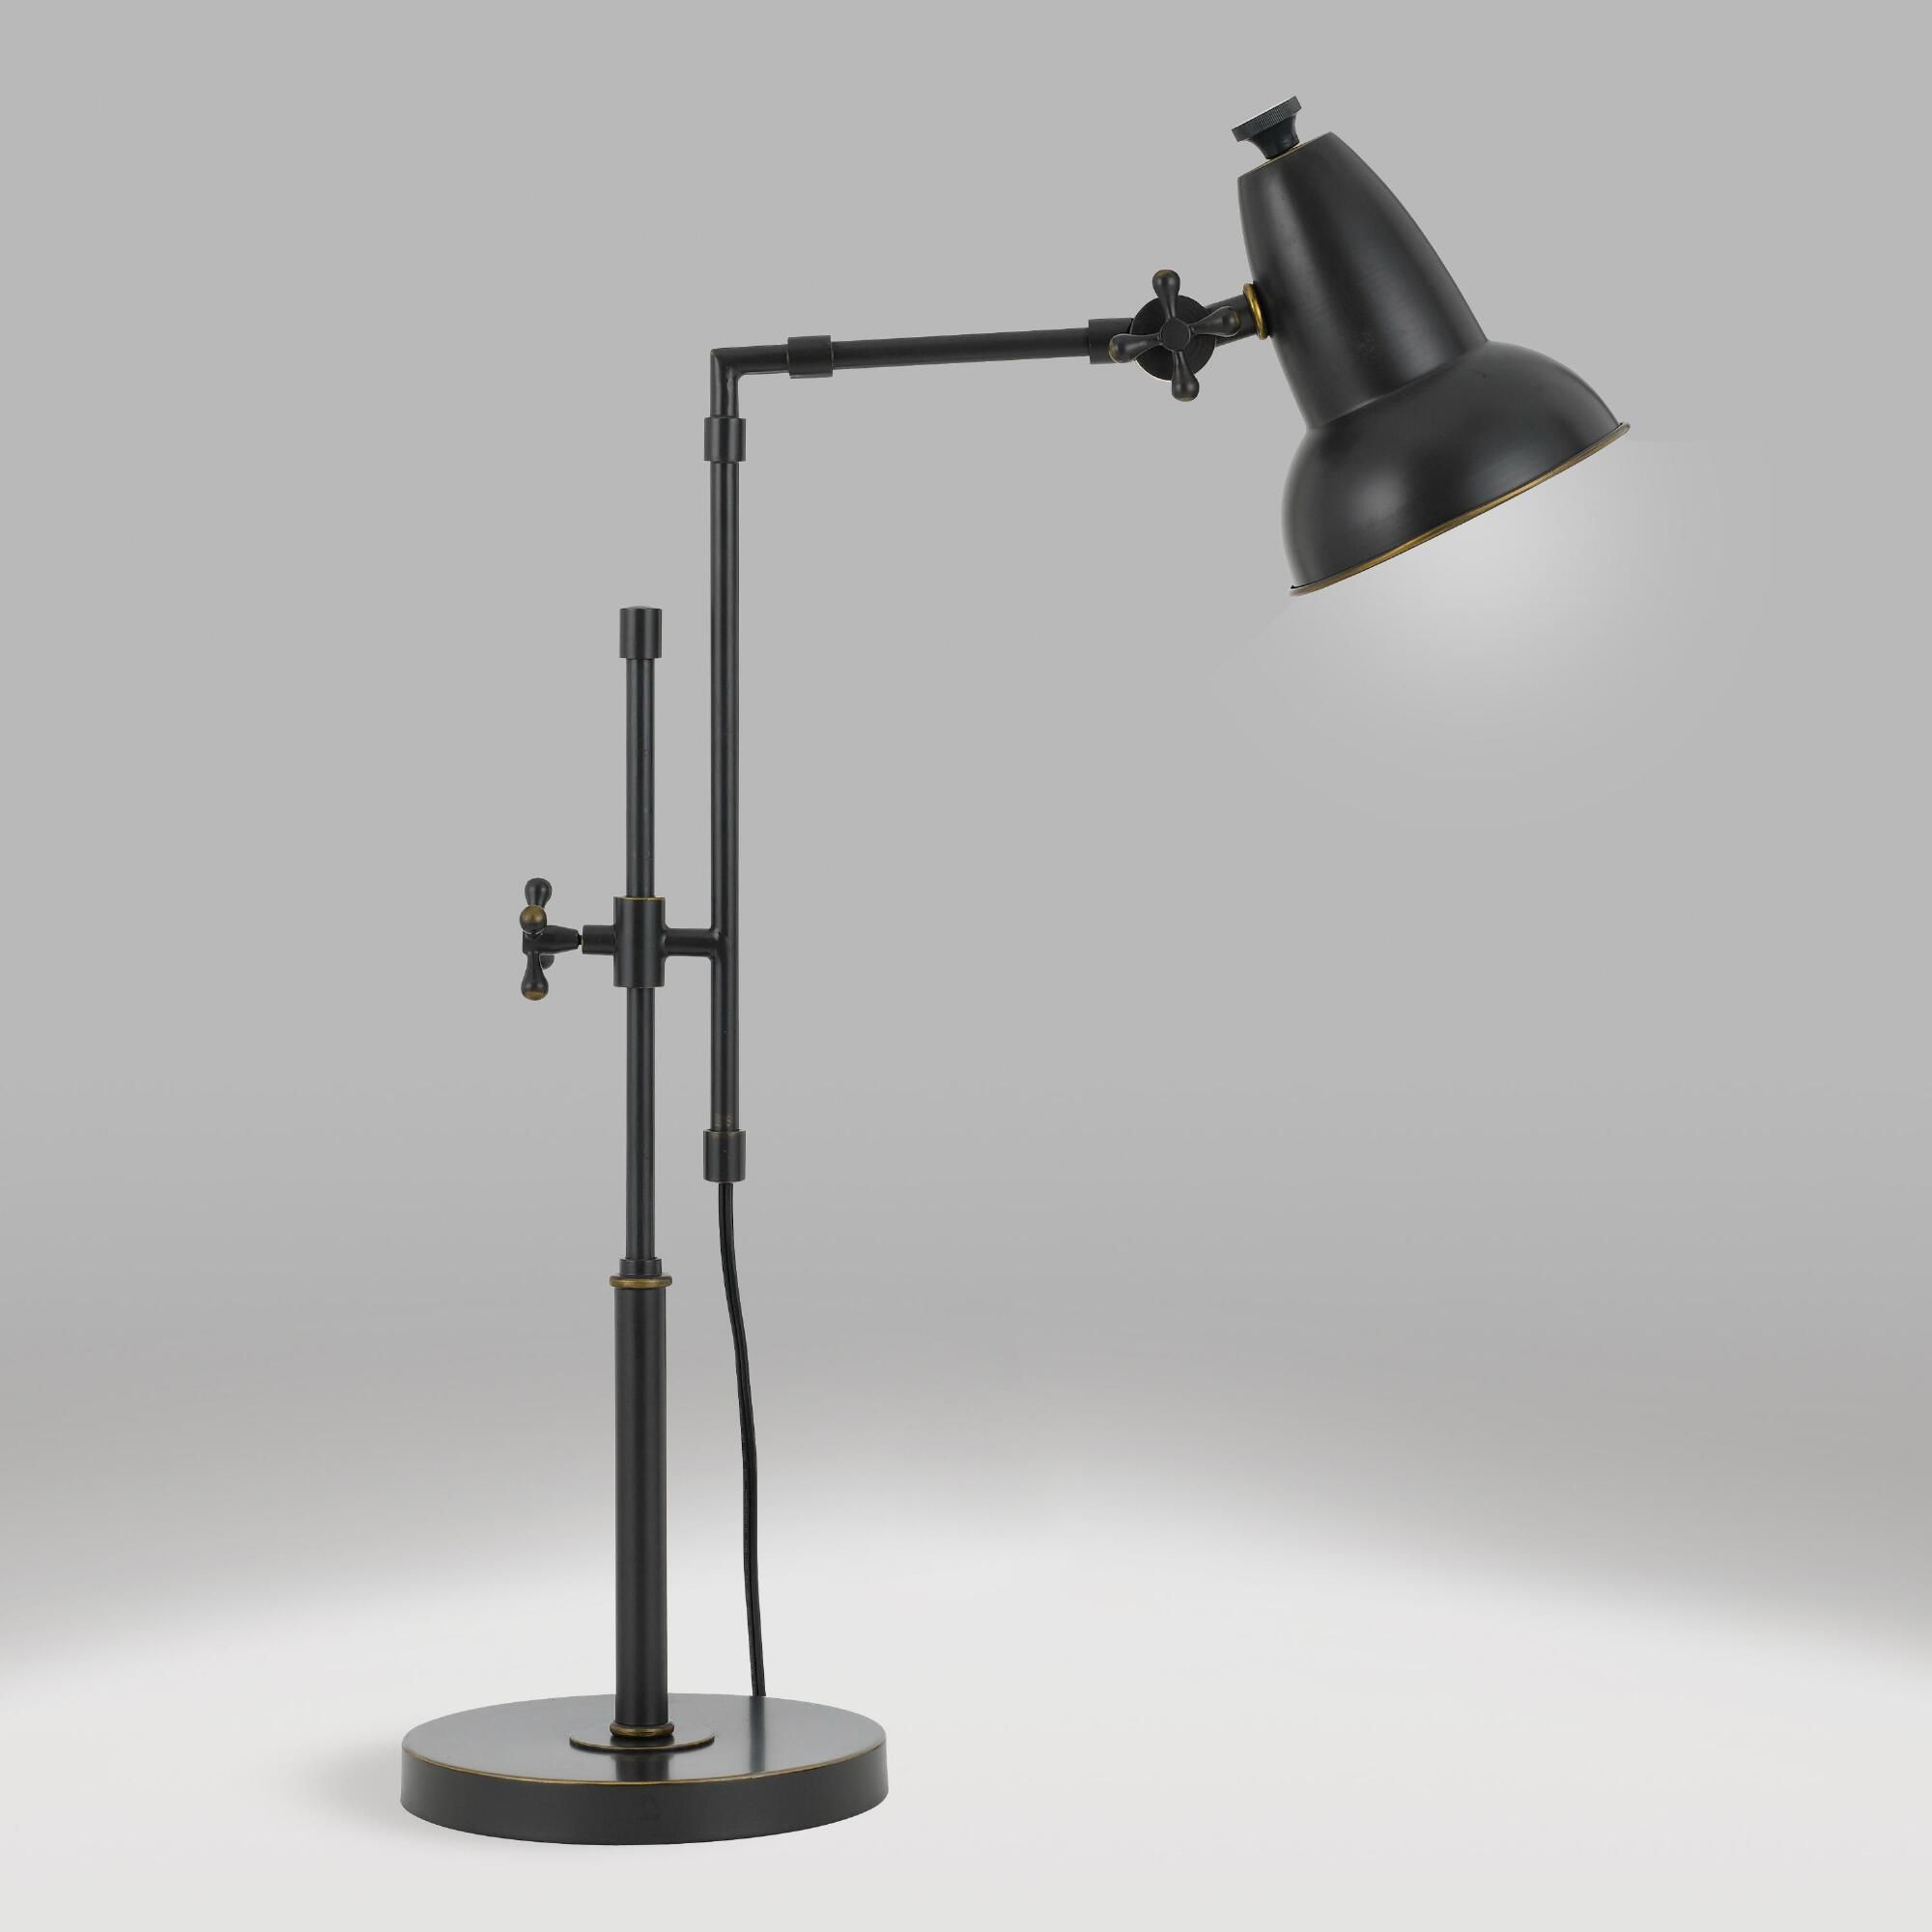 Oil Rubbed Bronze Adjustable Sable Desk Lamp By World Market Desk Lamp Lamp Best Desk Lamp